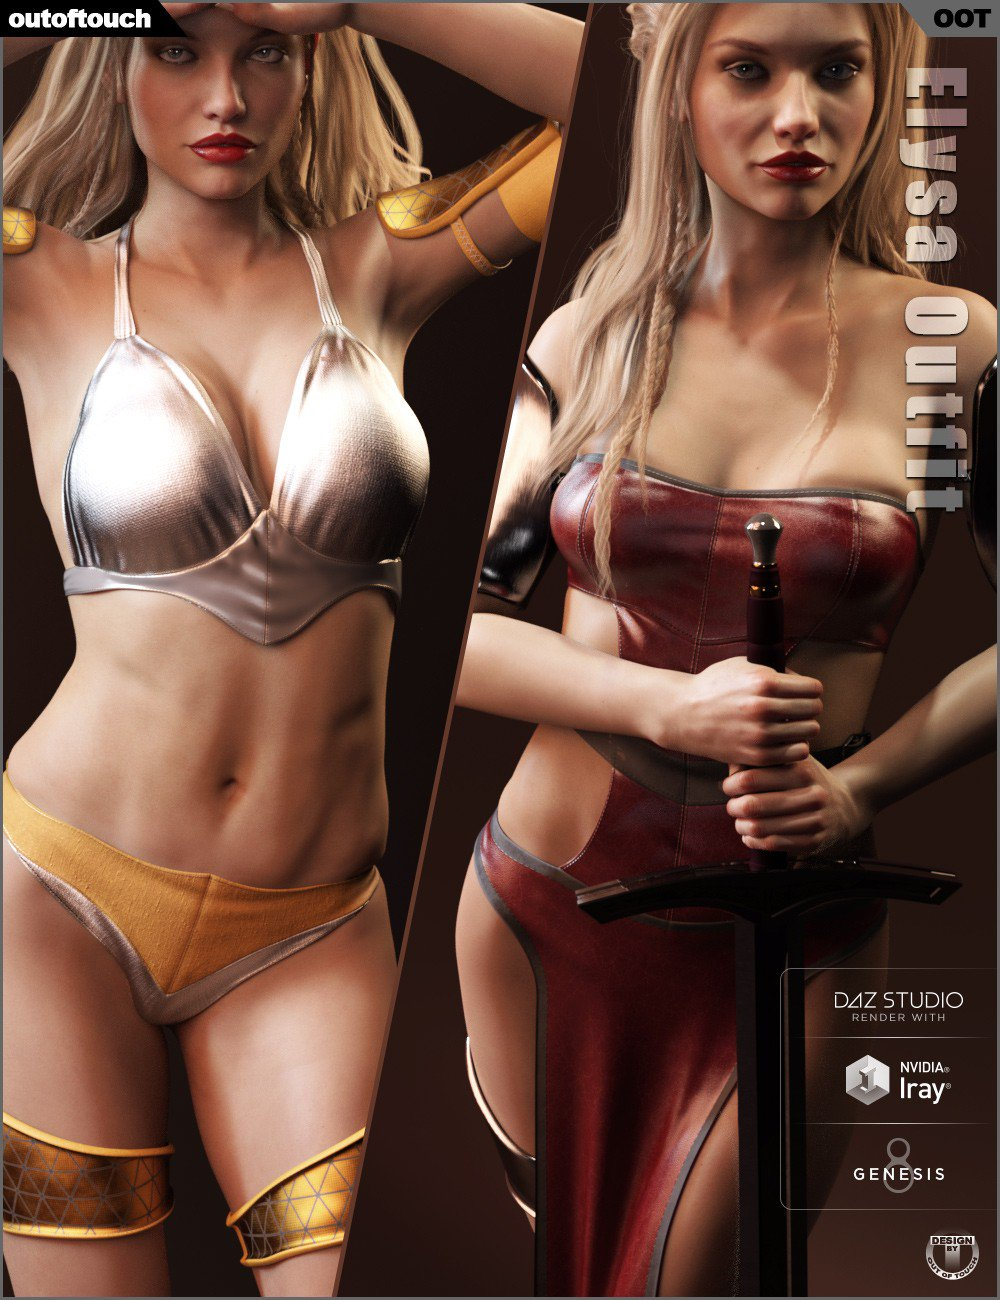 Elysa Outfit for Genesis 8